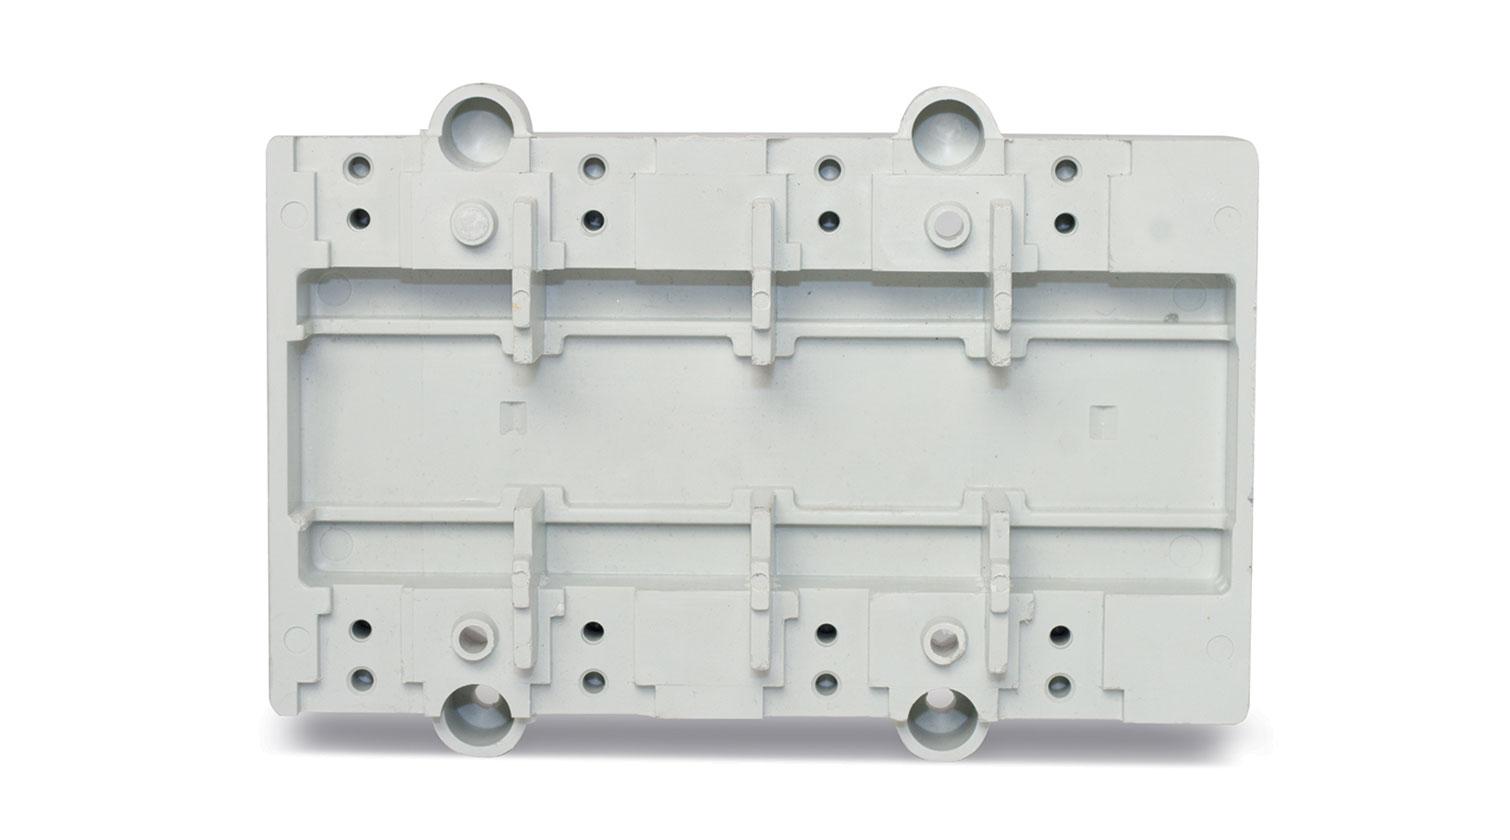 INT CNC Imes Icore GFV plastic sample